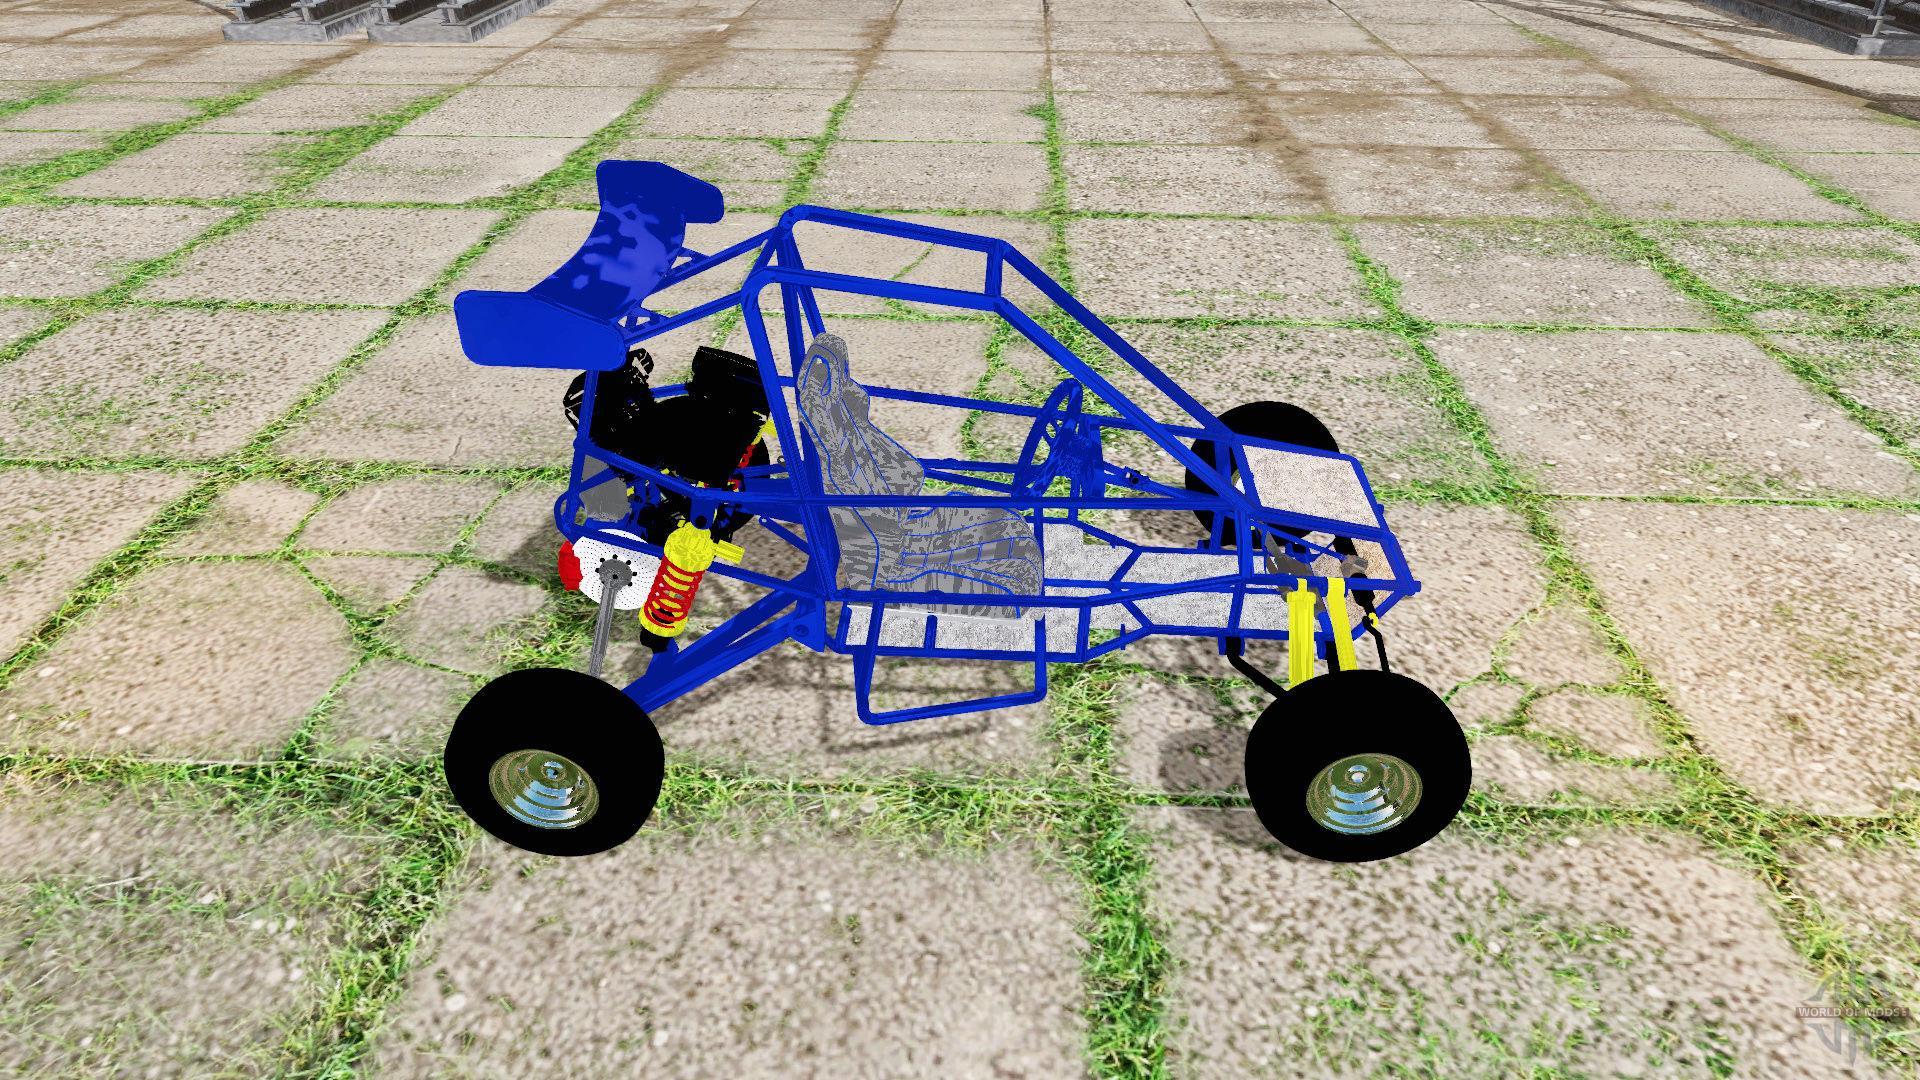 Crazy kart » GamesMods net - FS19, FS17, ETS 2 mods